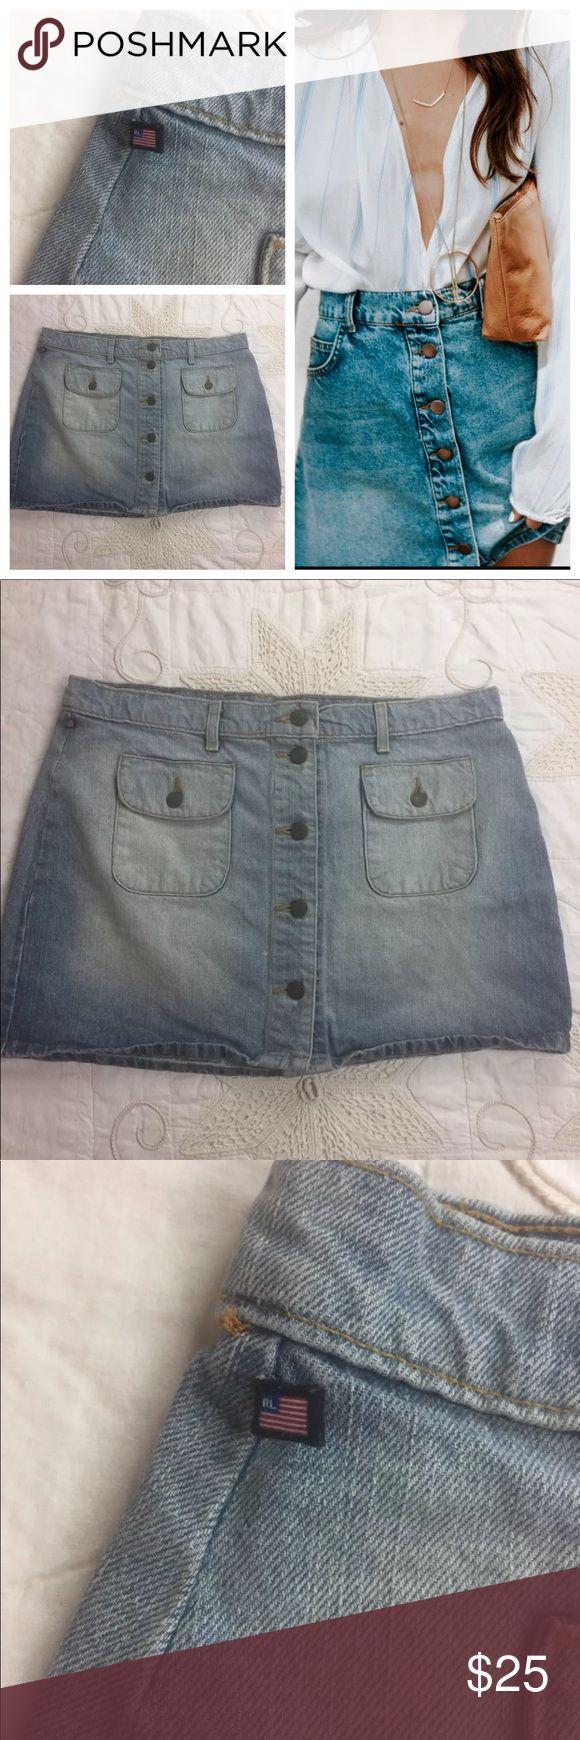 "Ralph Lauren button up skirt denim size 14 Size 14 Light Denim Mini Raph Lauren Skirt Button Down Front  Waist- 28"" Rise- 15"" StockCA9B39 *** model photo is not actual item used for style ideas*** Ralph Lauren Skirts Mini"